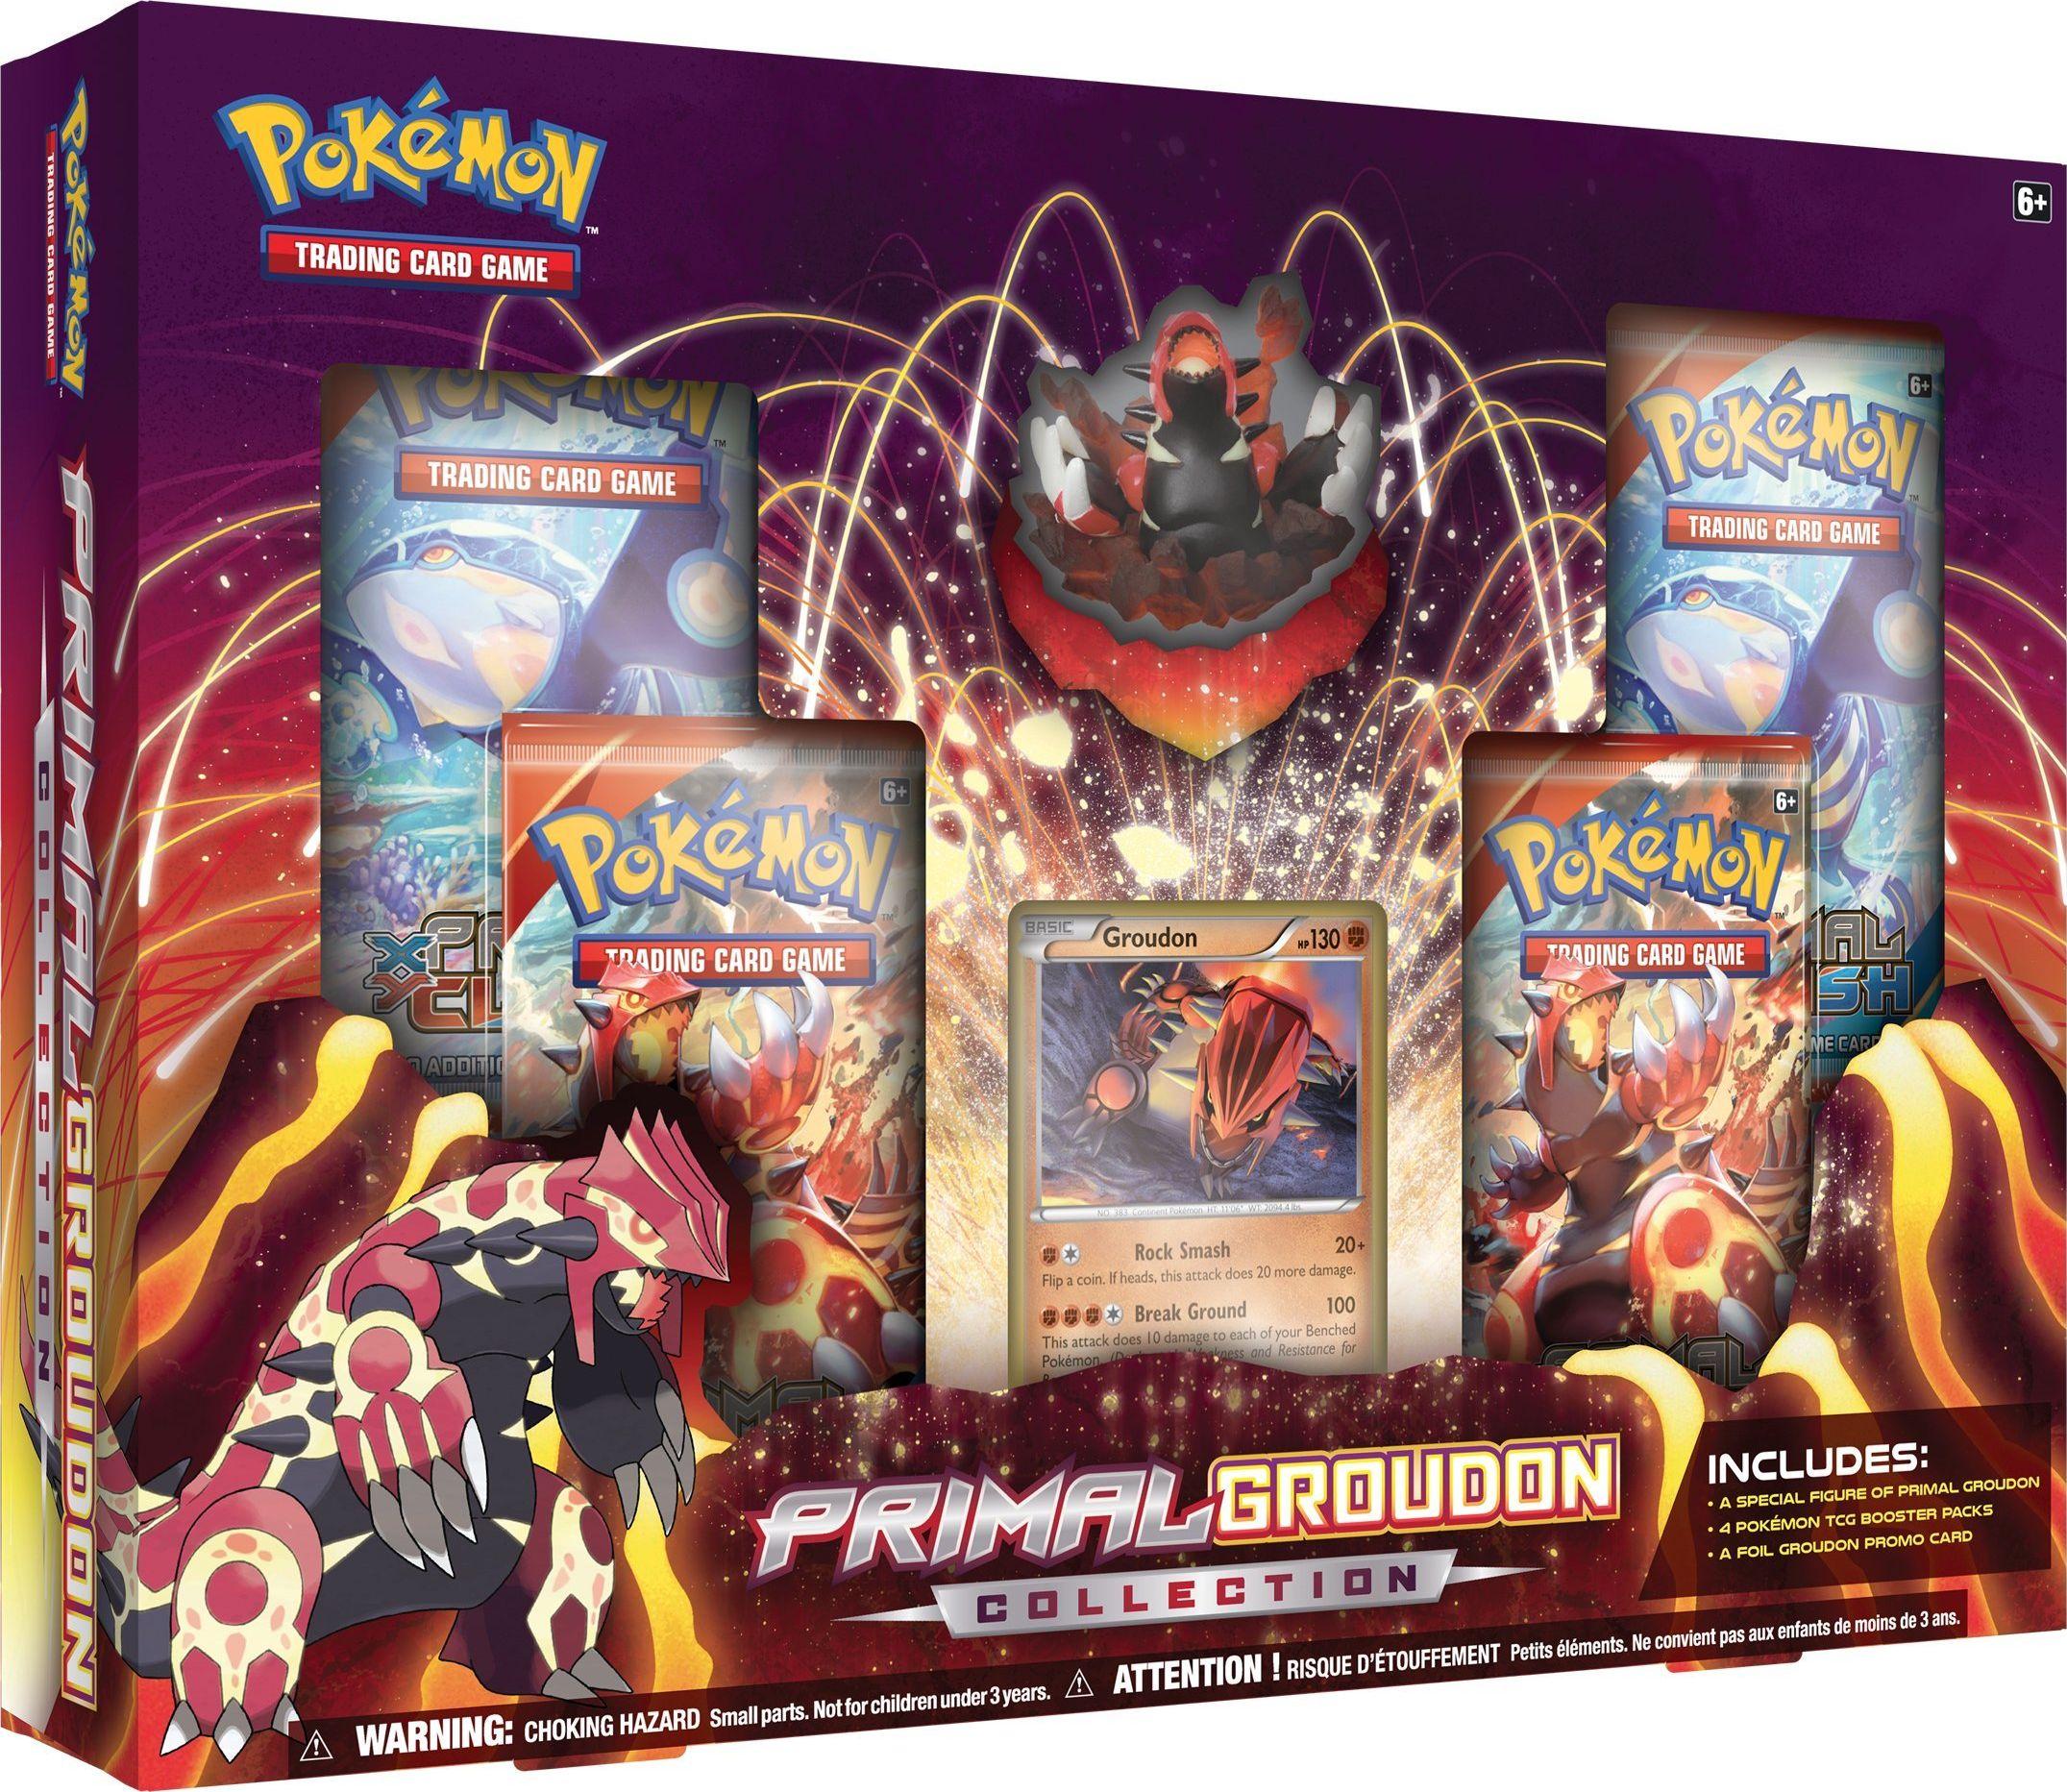 Primal Kyogre Card Pokémon Tcg Primal Groudon Primal Kyogre Mega Diancie Ex